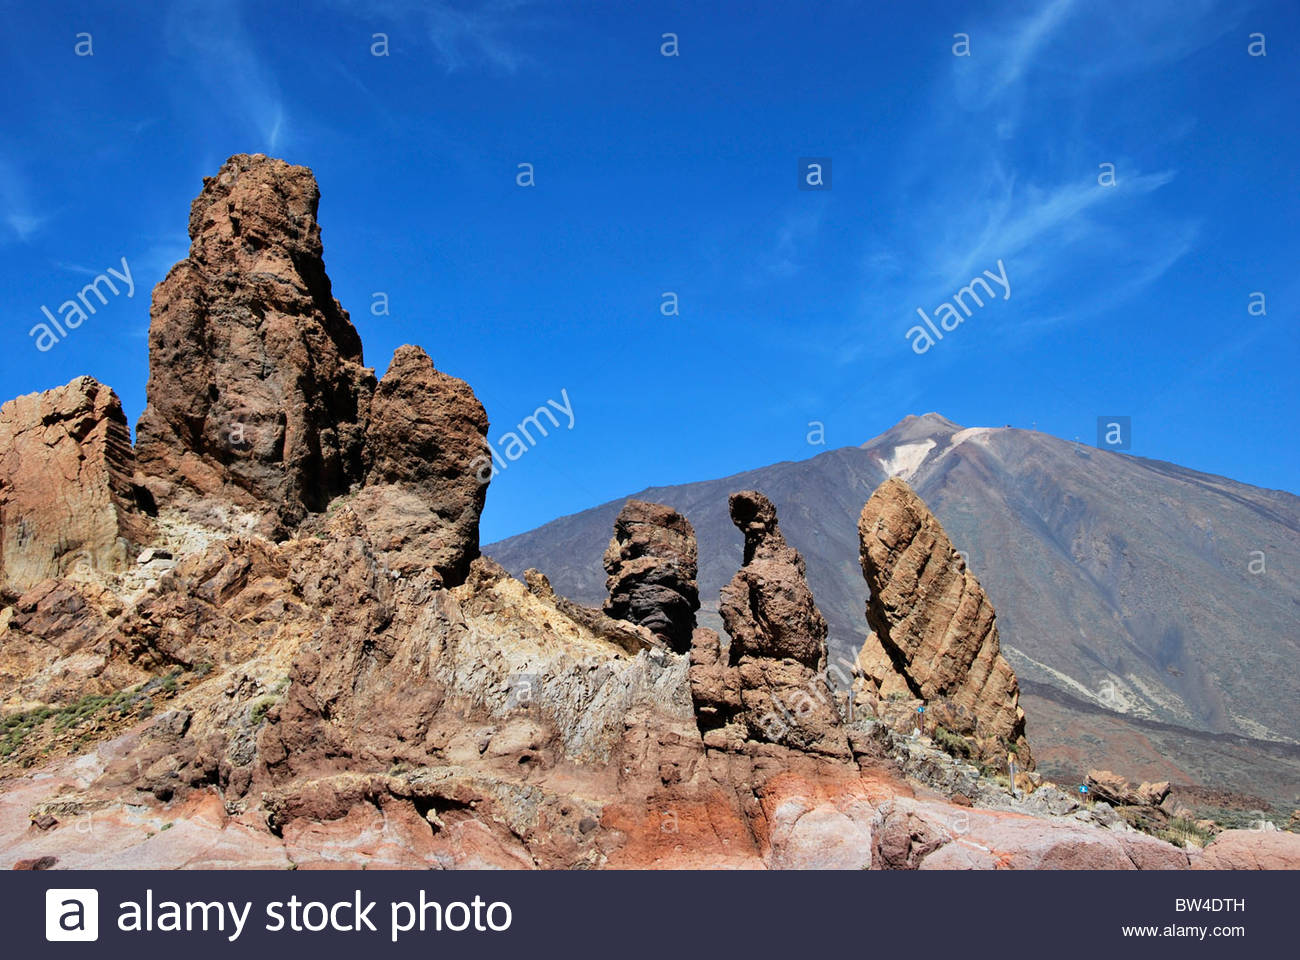 Roques de Garcia. Felsformation in den Teide. Teneriffa. Kanarischen Inseln. Spanien Stockbild